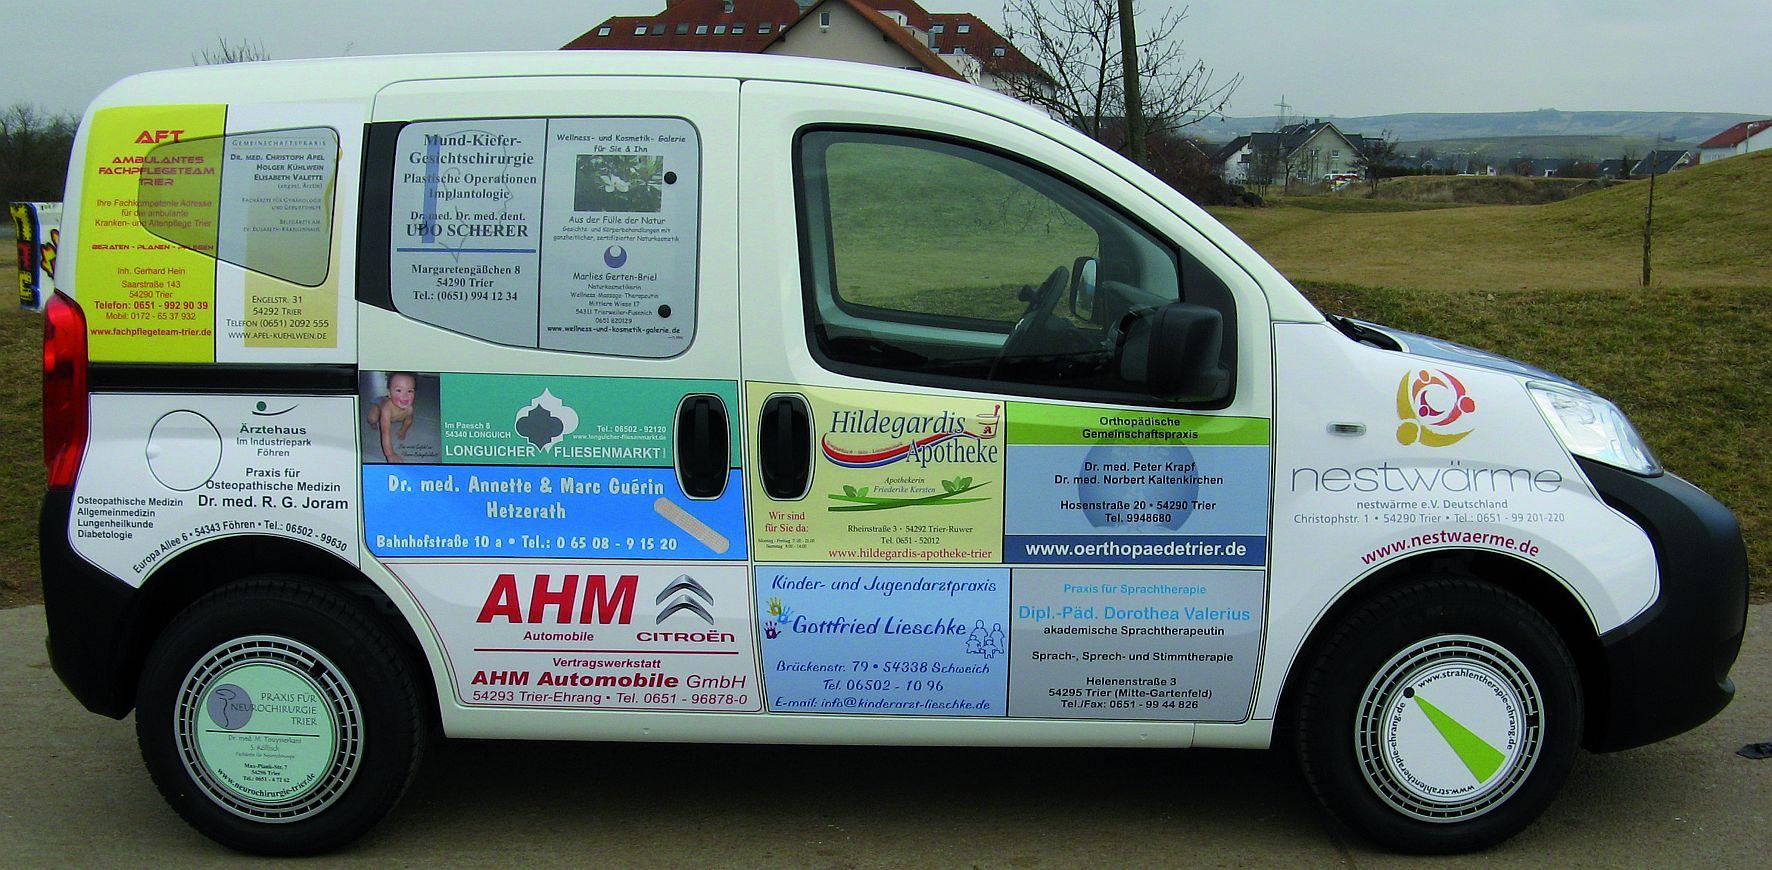 Sponsoring PKW Verein